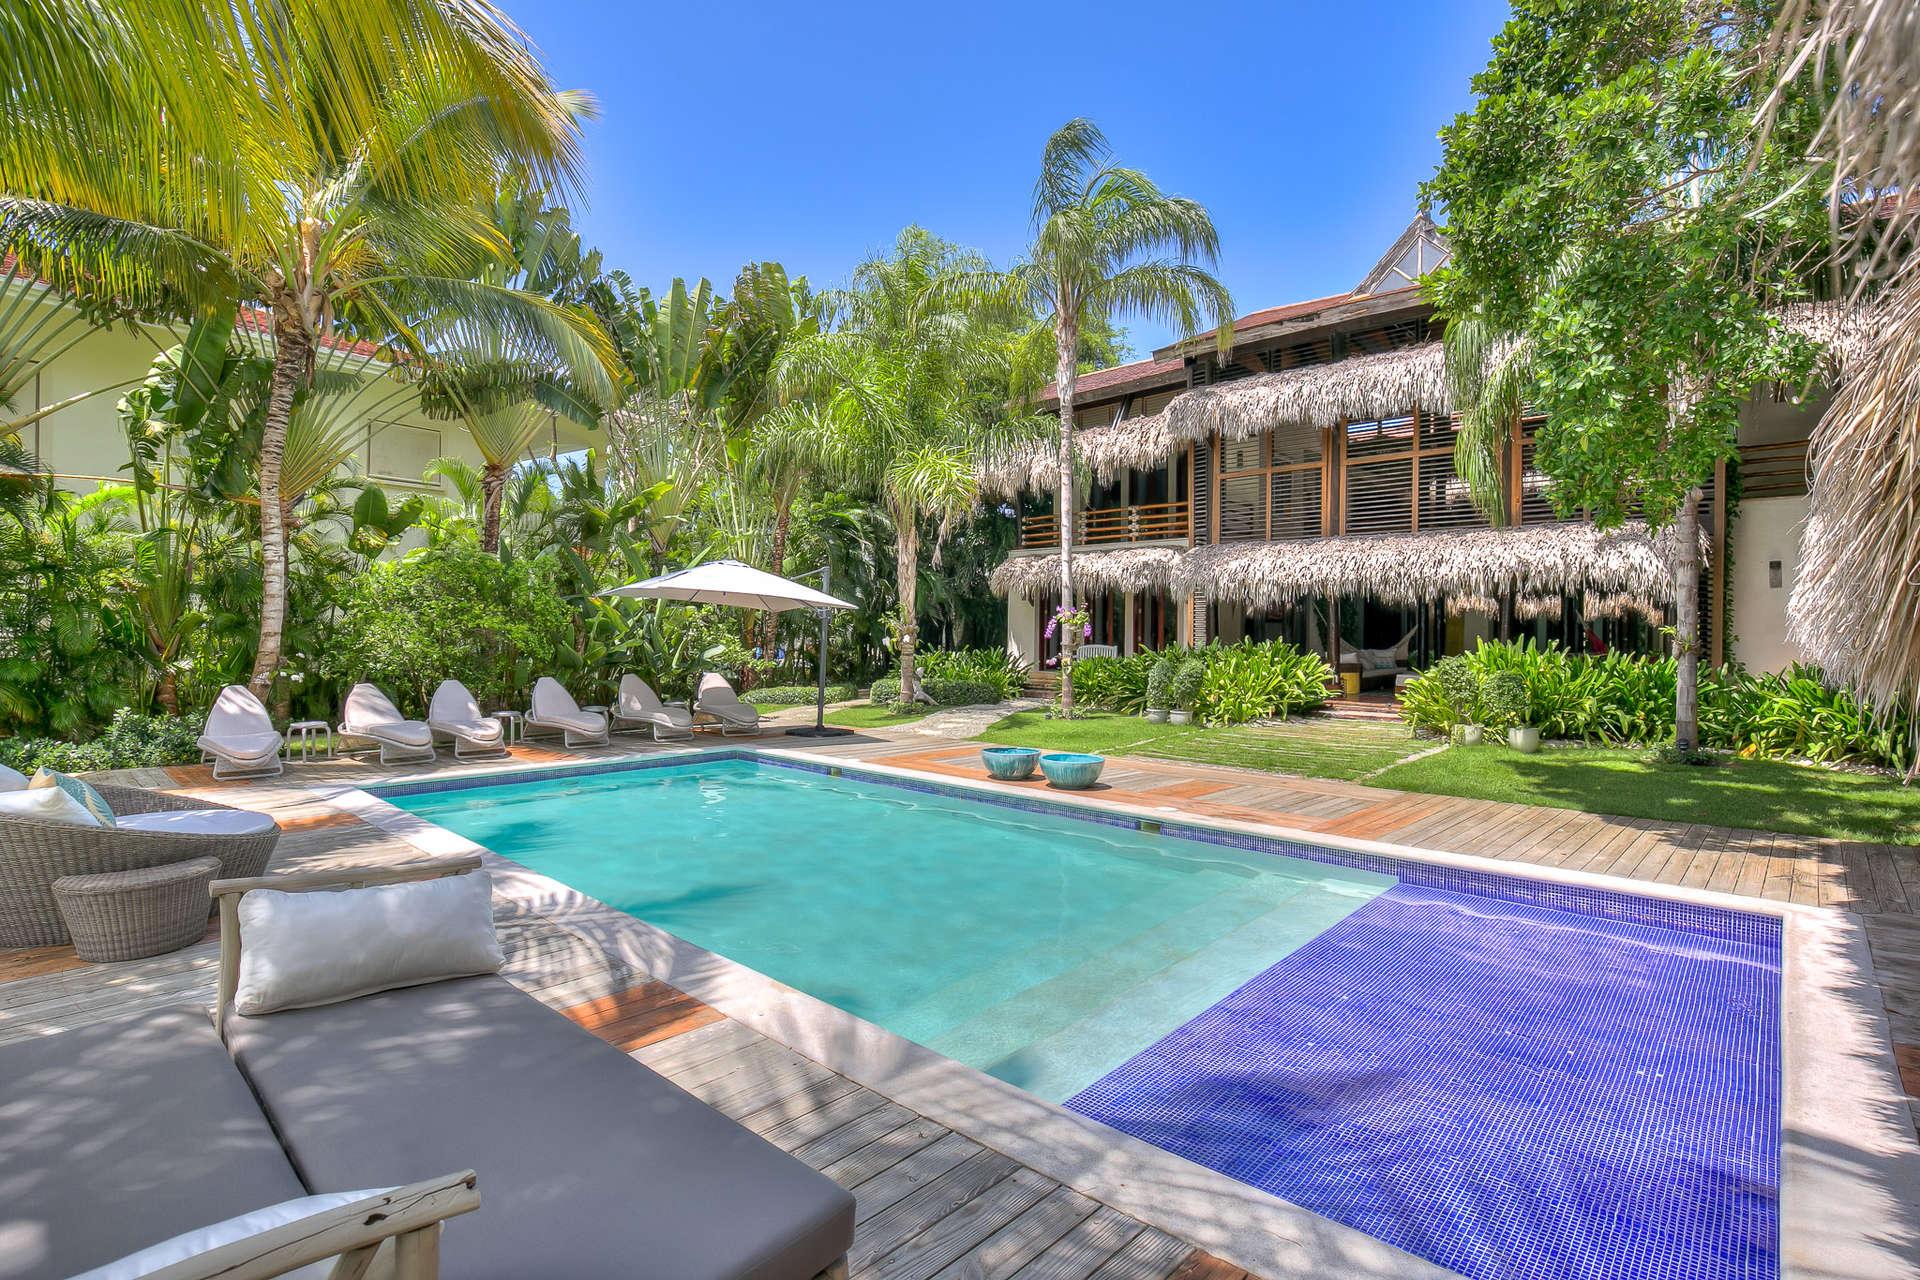 Luxury villa rentals caribbean - Dominican republic - Punta cana - Punta cana resort and club - Tortuga Bay C17 - Image 1/24